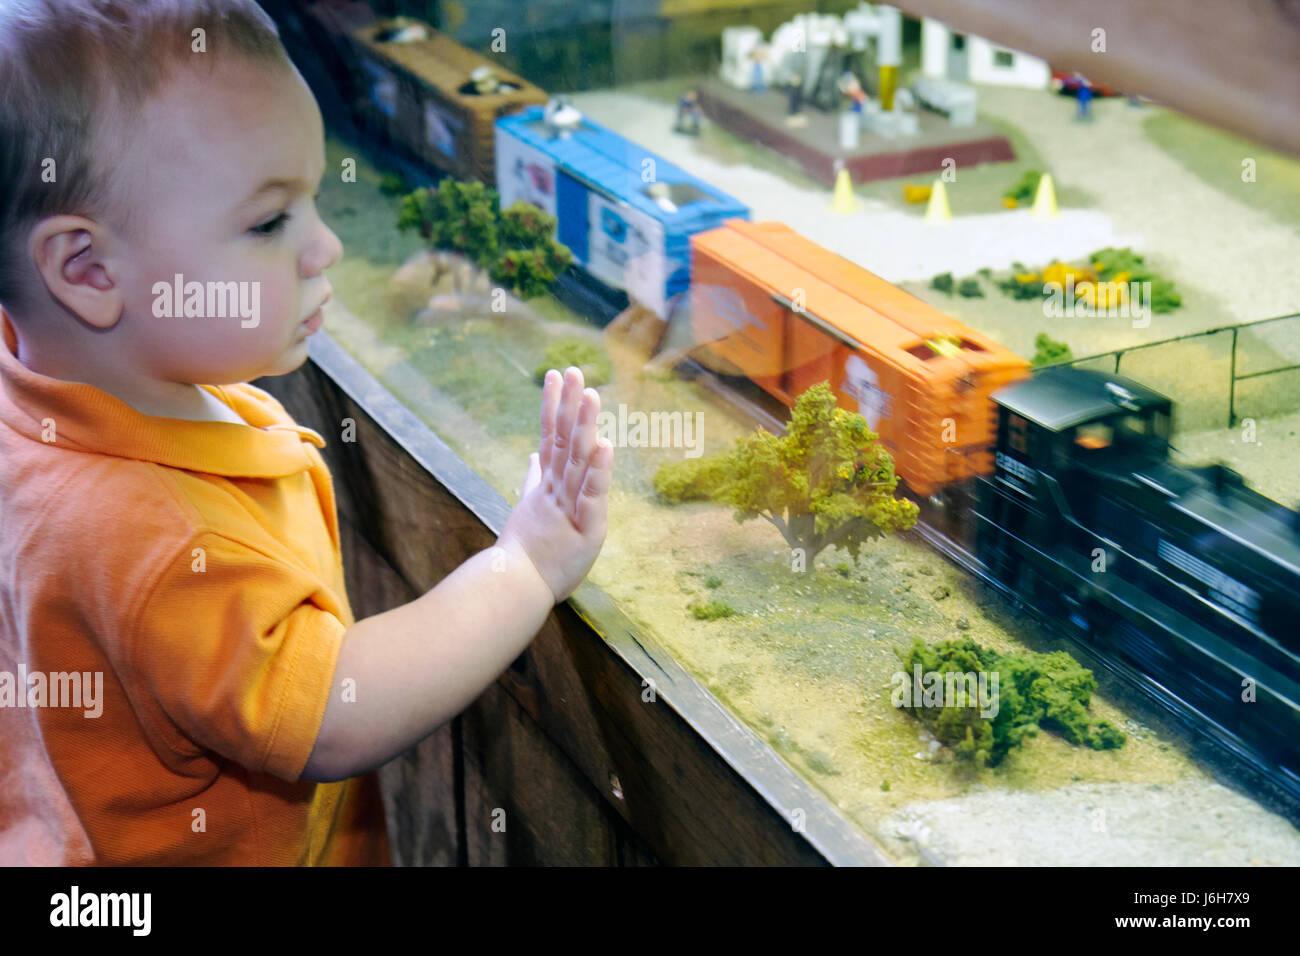 Virginia Roanoke Virginia Museum of Transportation O gauge Model Train Layout exhibit miniature boy watches - Stock Image